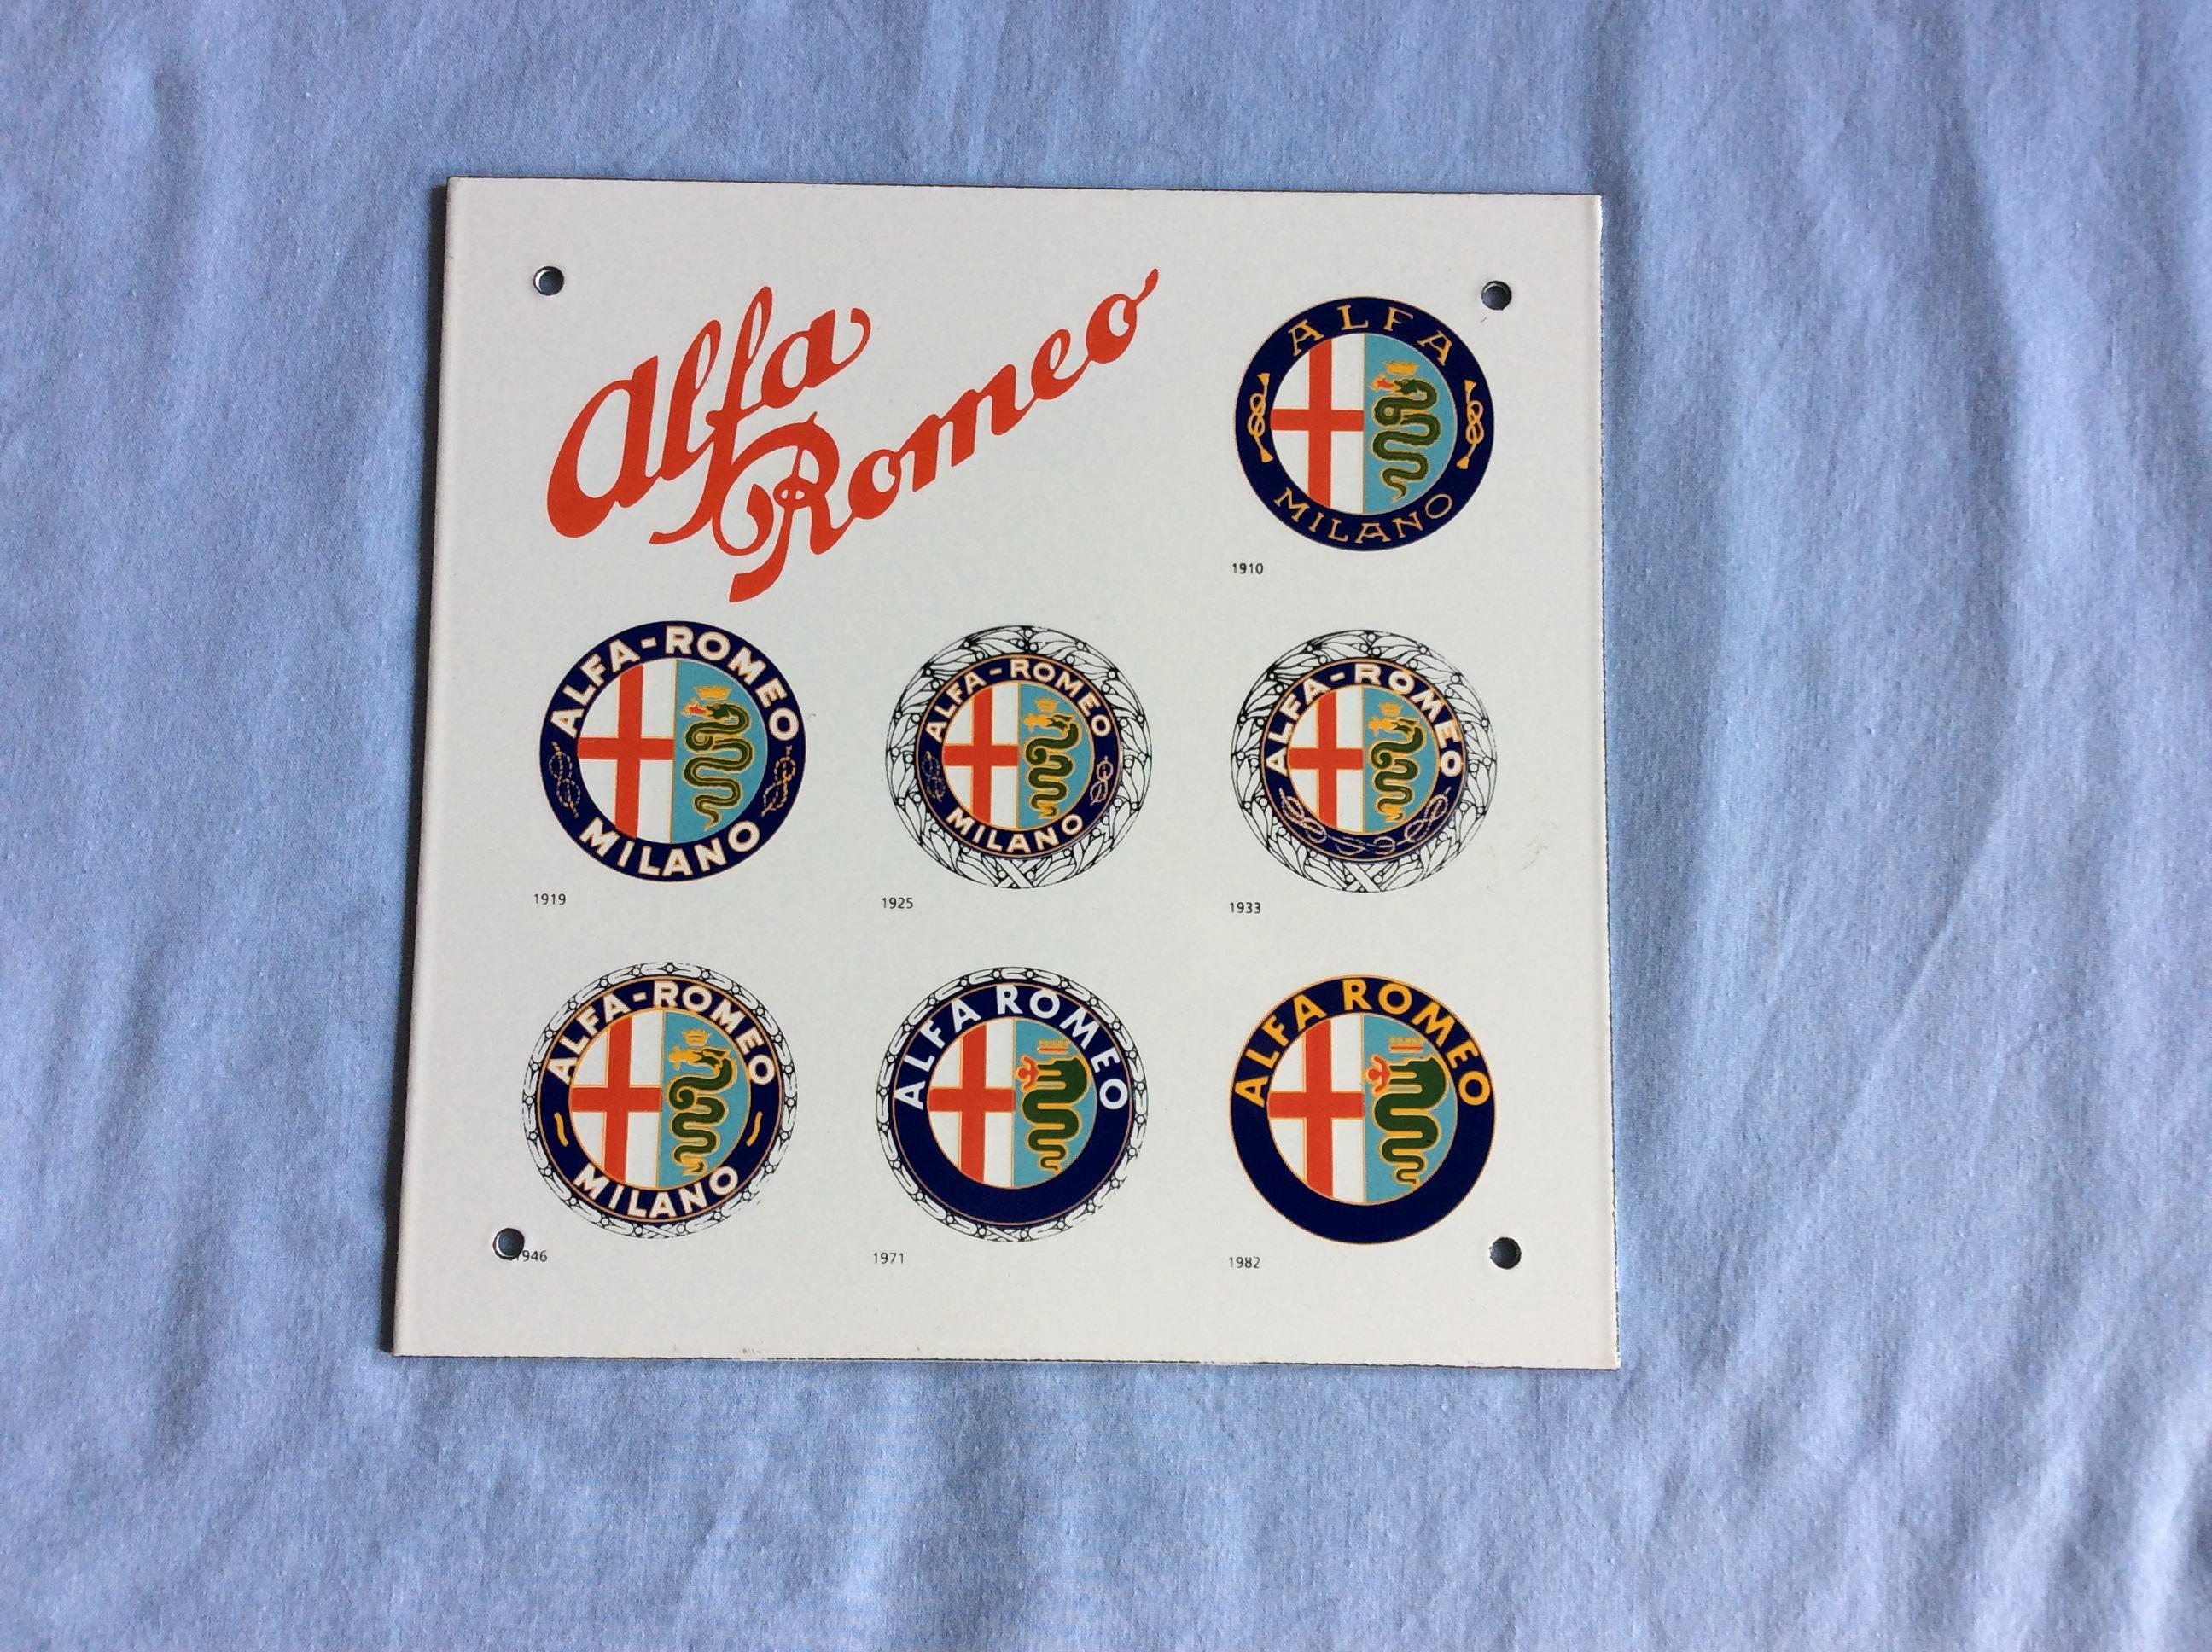 Alfa Romeo Alfa Romeo Classic Car Memorabilia Alfa Romeo Signs